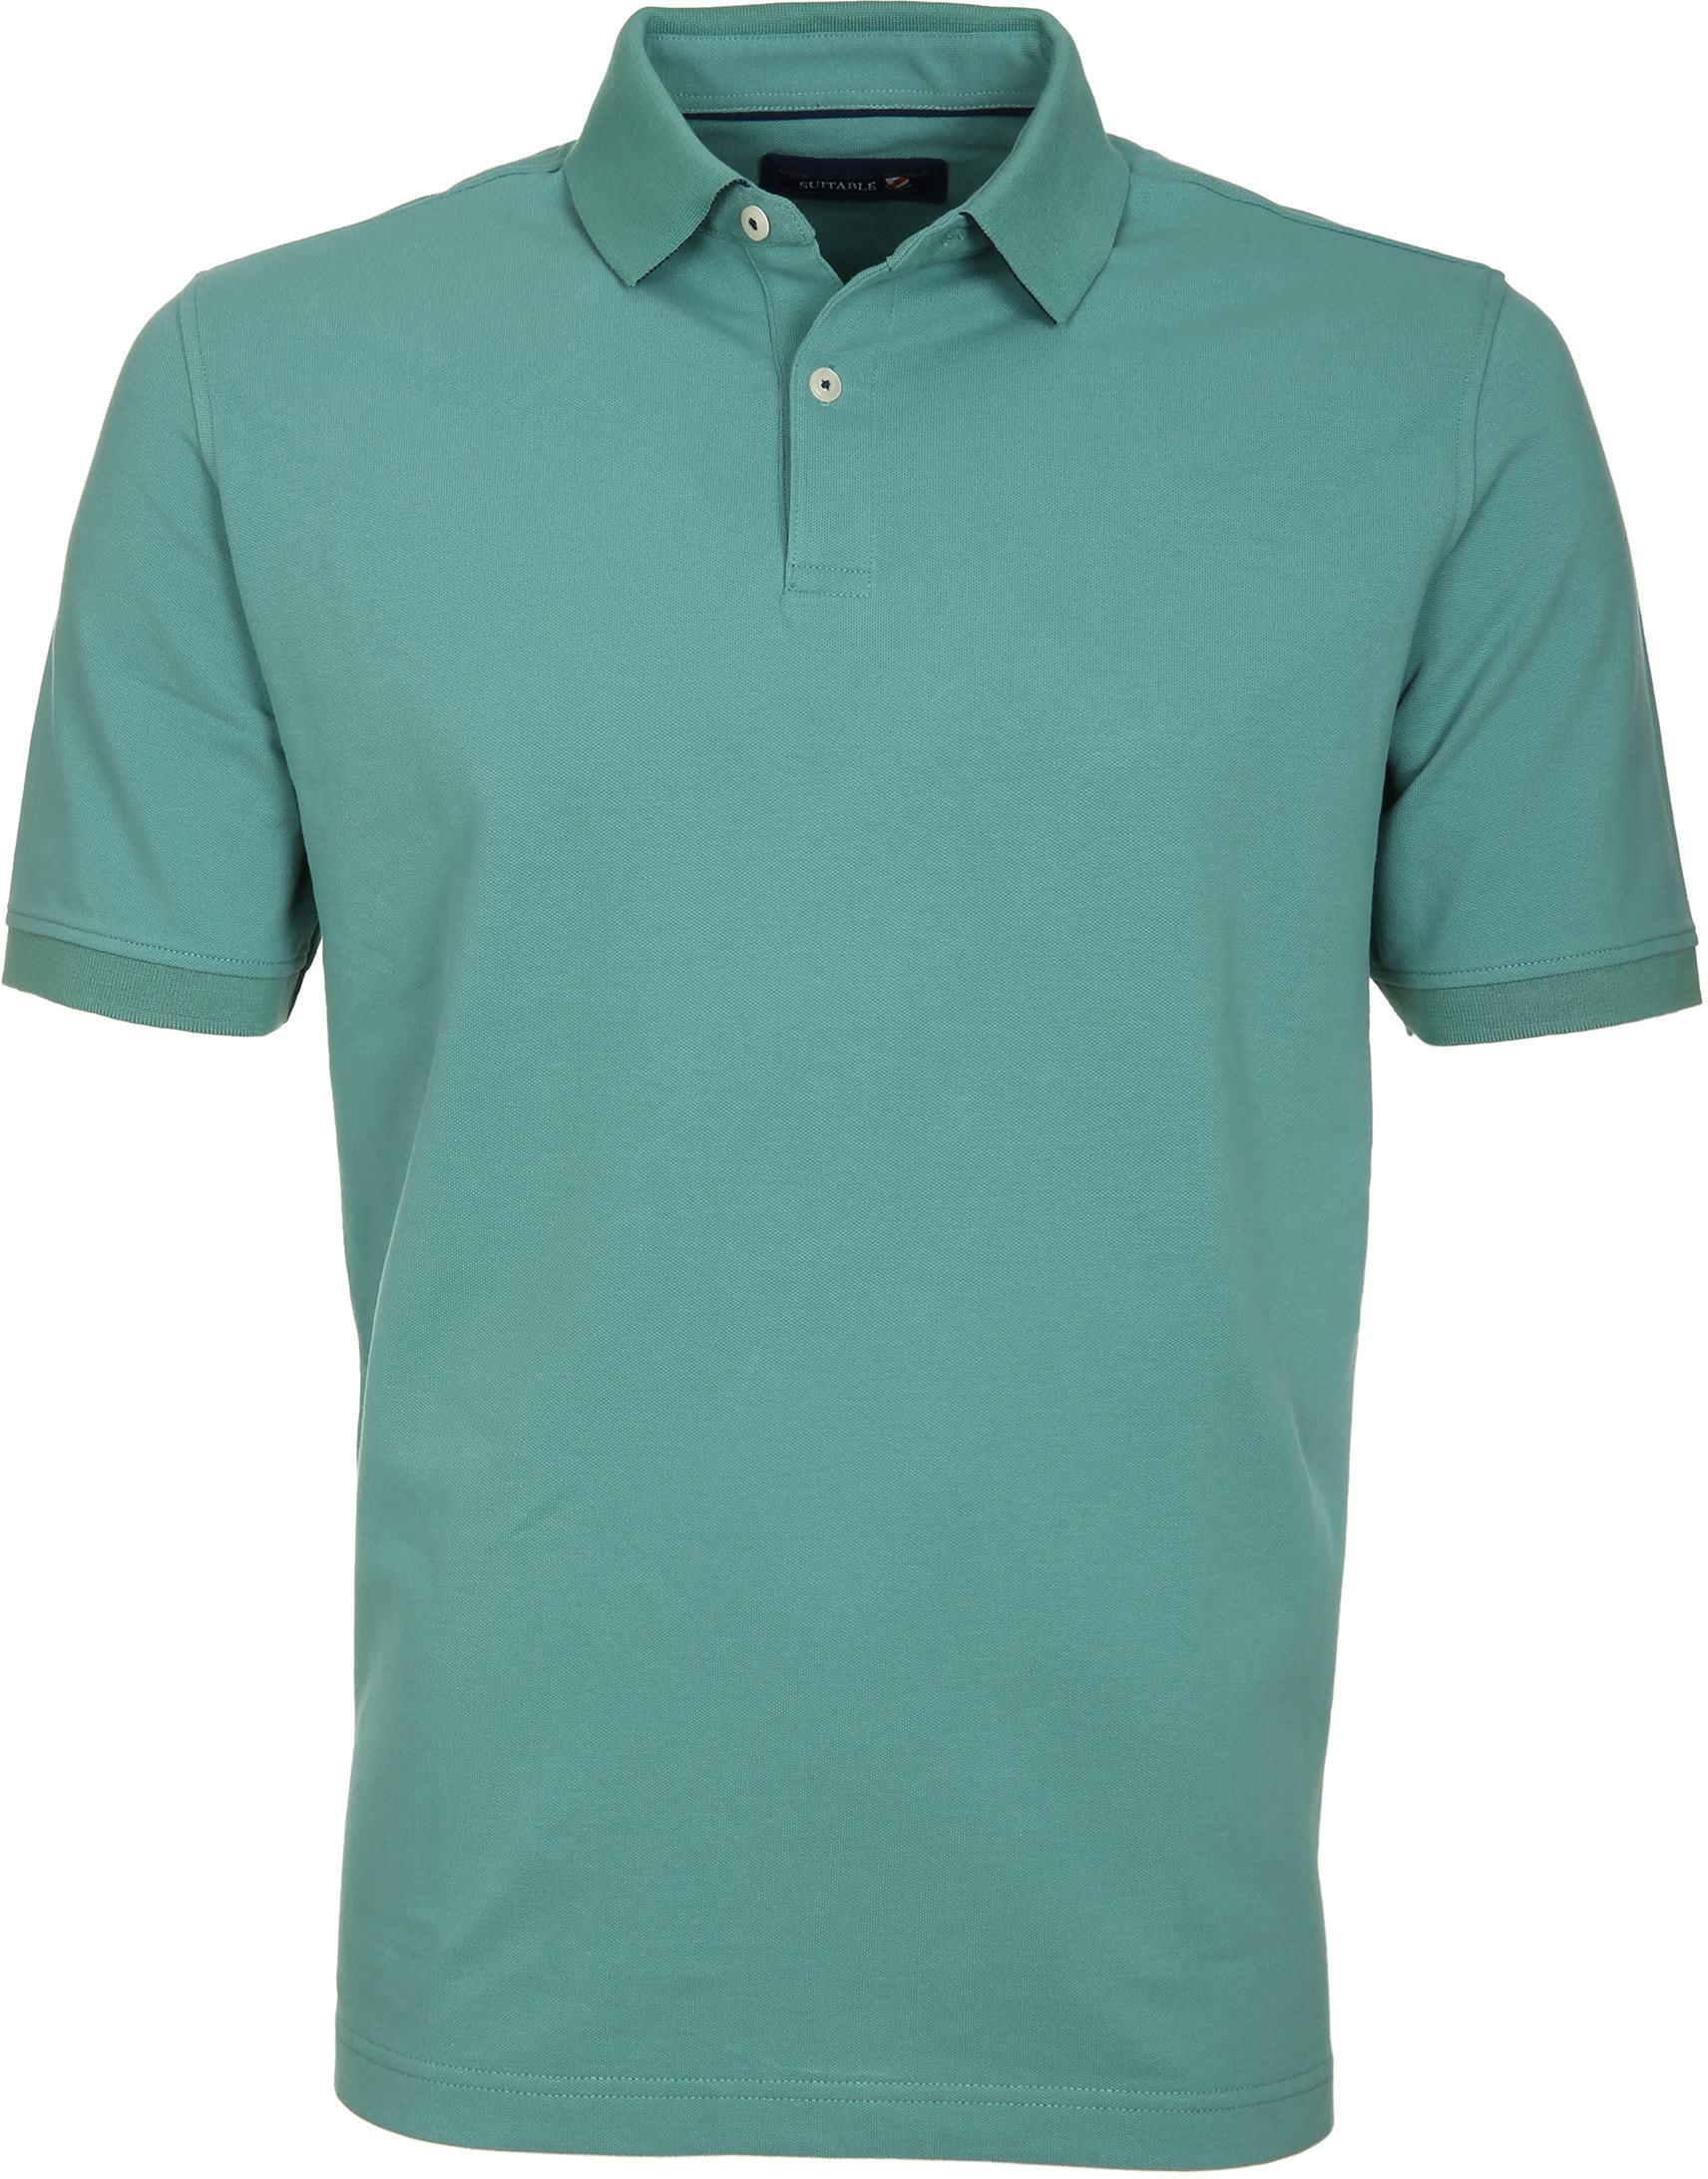 Suitable Poloshirt Basic Grün foto 0